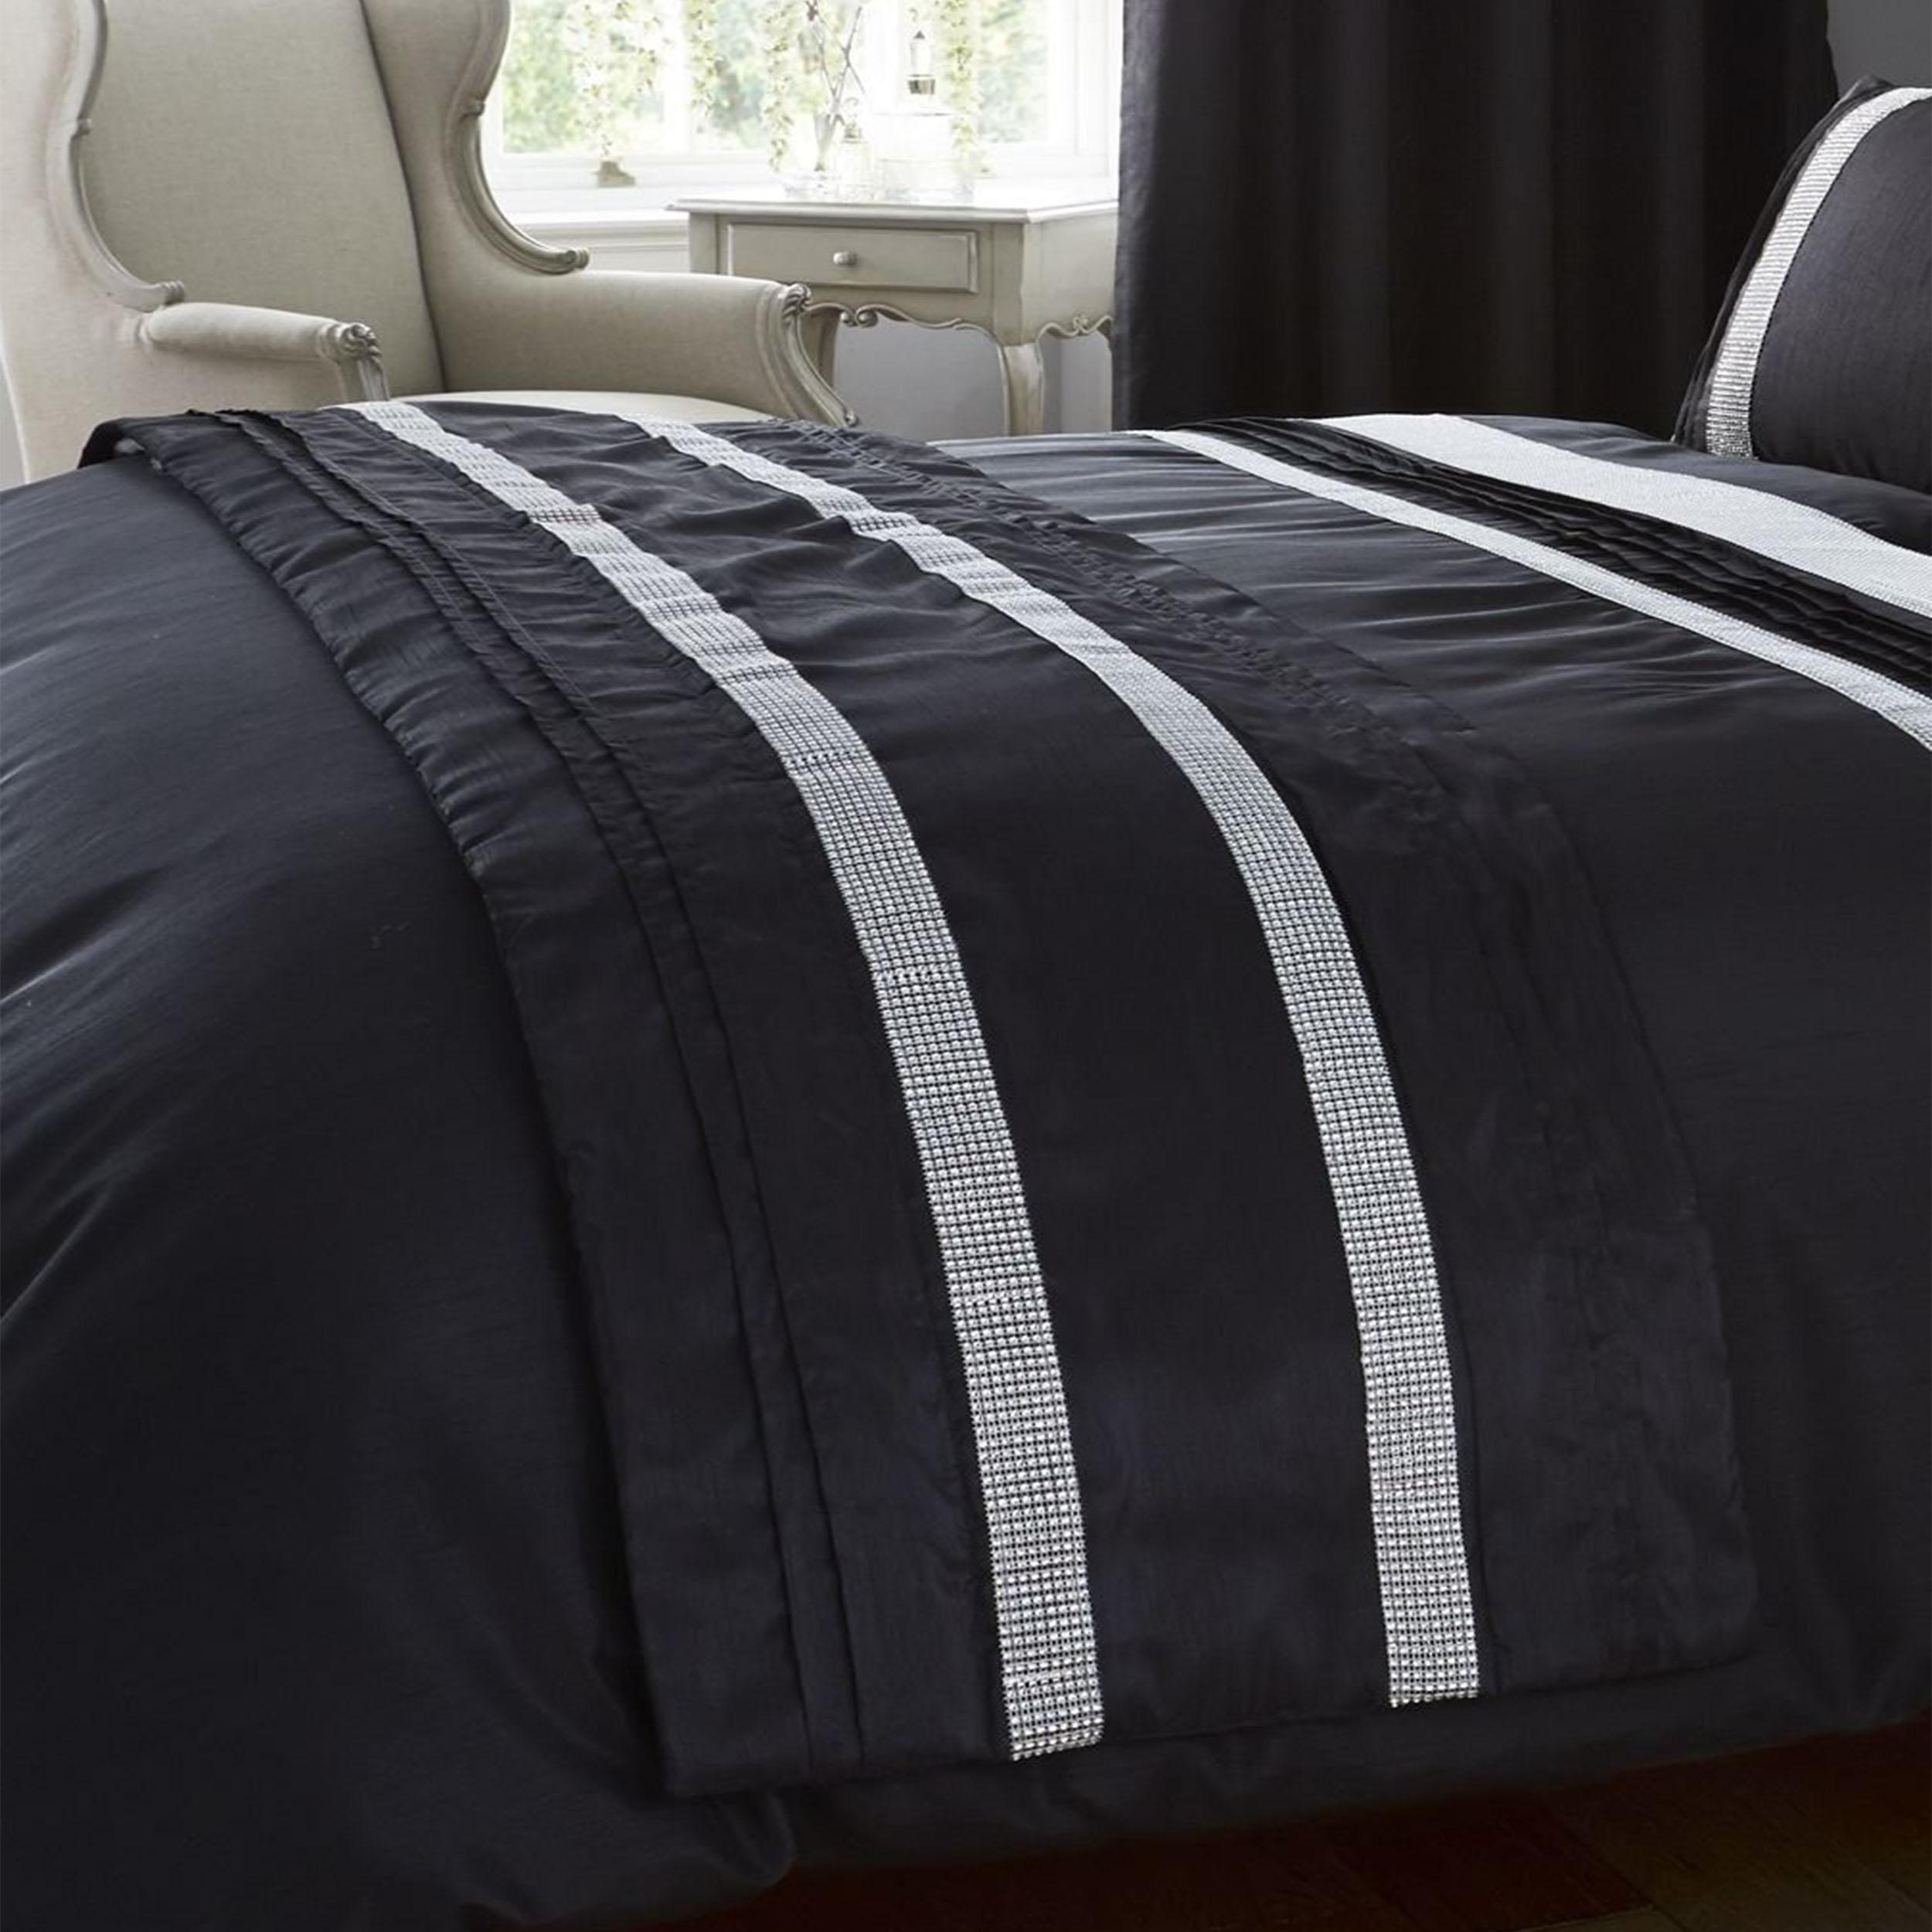 Kimberley Decorative Throw Diamante Modern Quilted Bed Runner Polyester Black 50 X 220 Cm Onlinestreet Uk